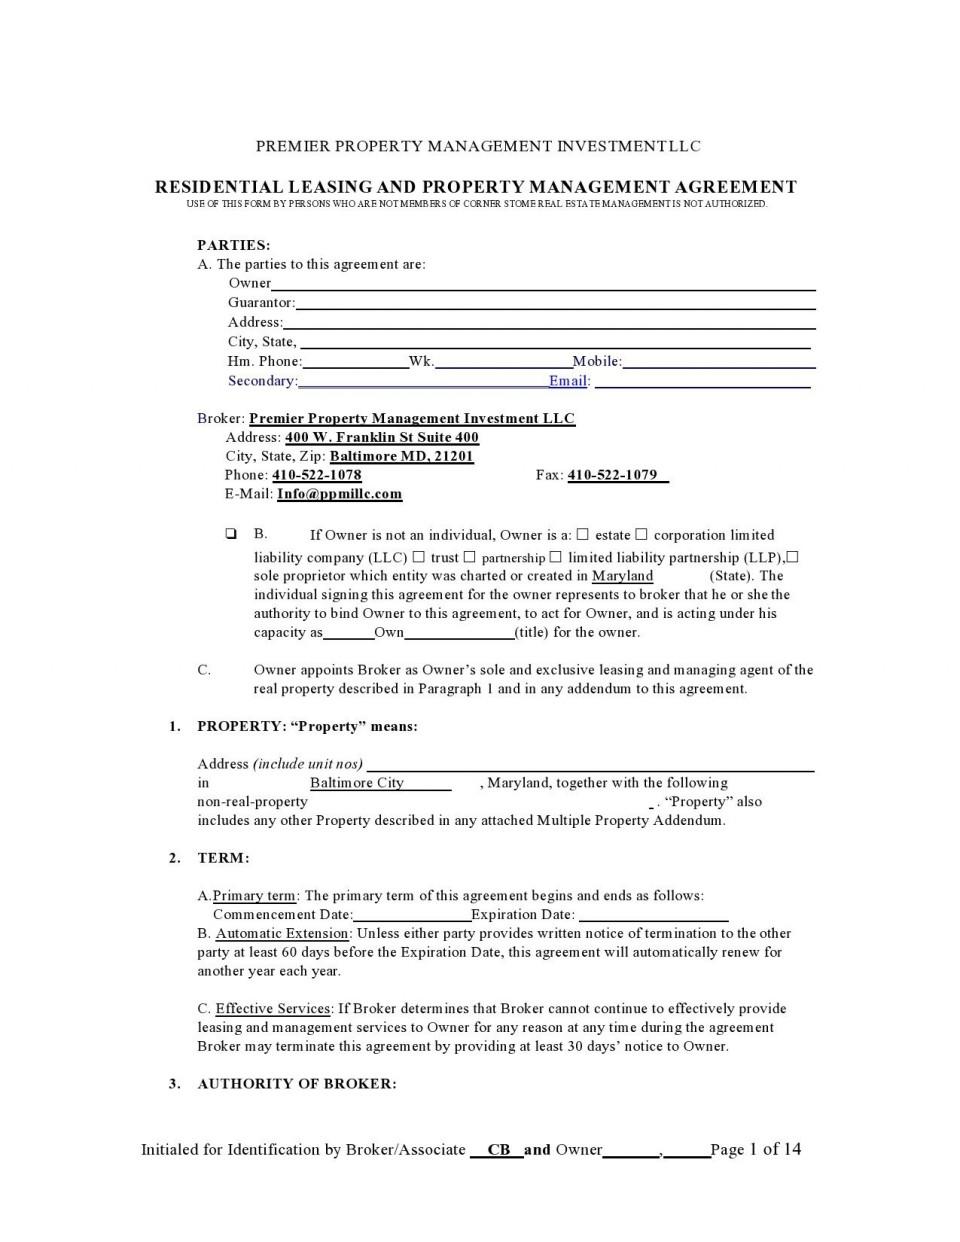 004 Impressive Commercial Property Management Agreement Template Uk Concept 960